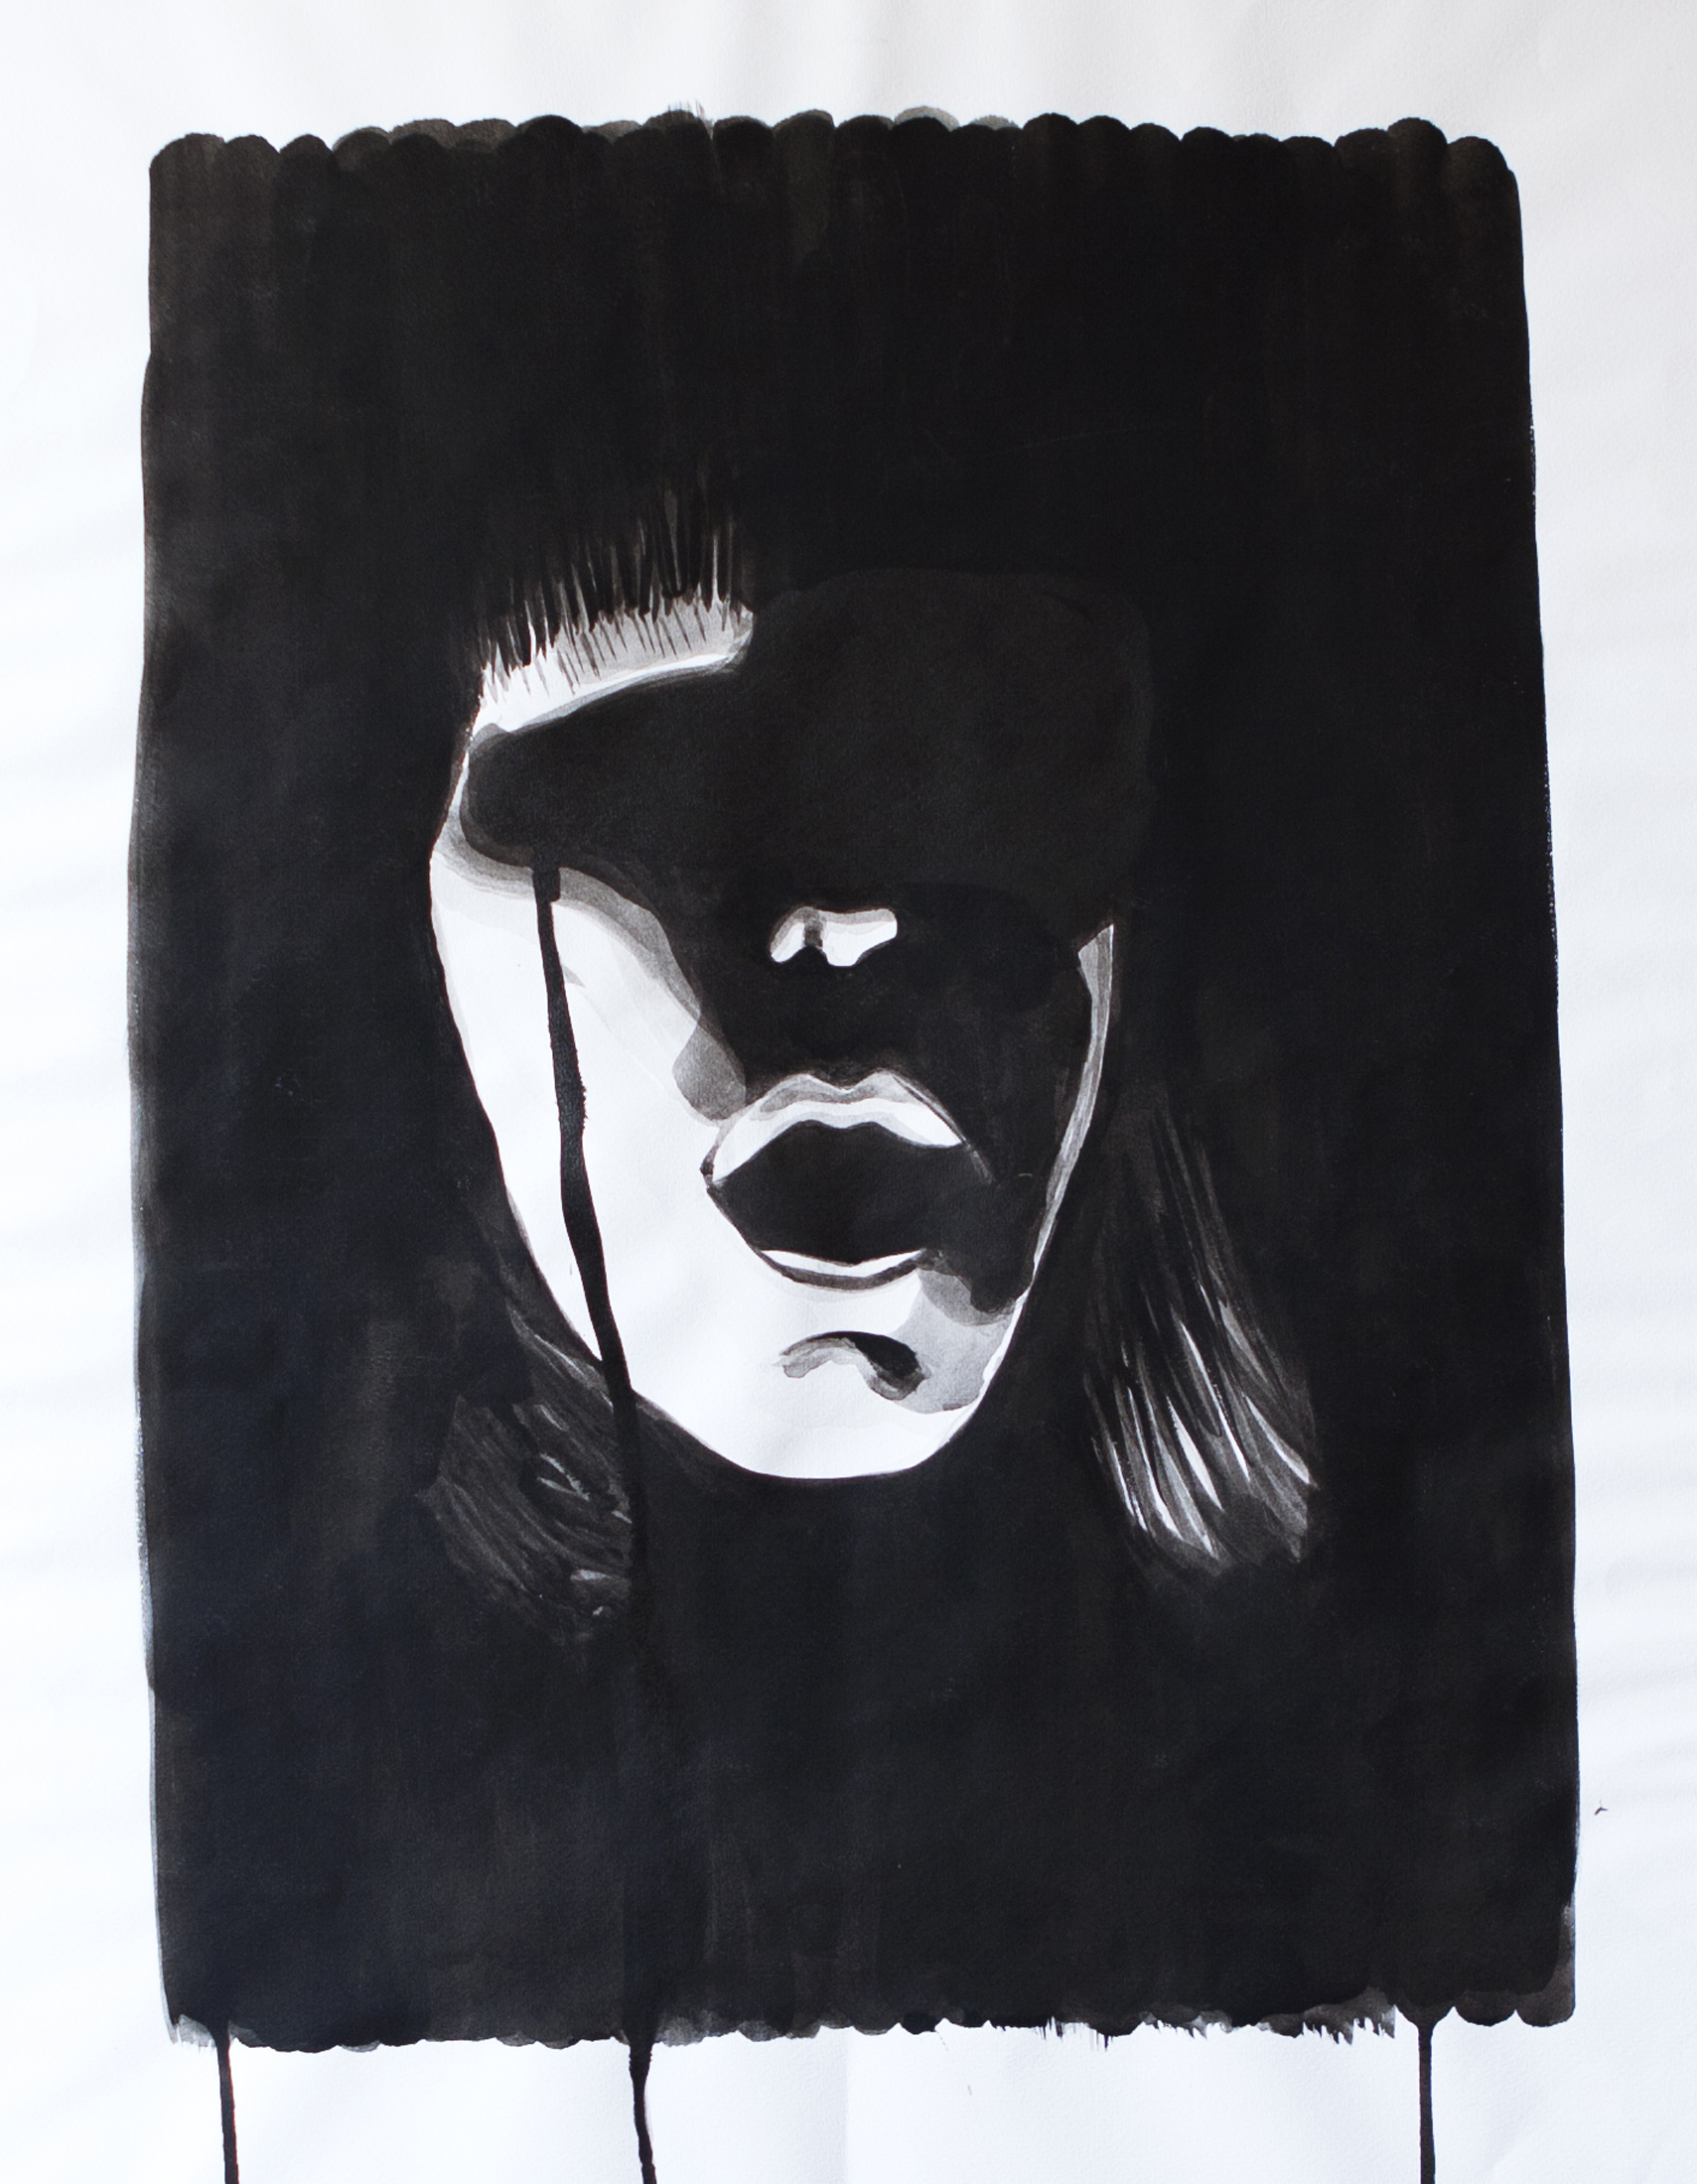 Self-Portrait VIII